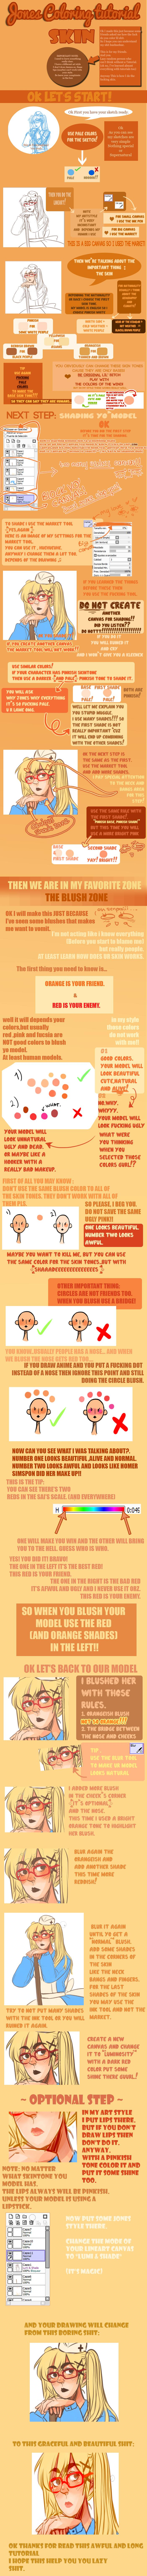 the worst coloring tutorial by NerdyJones